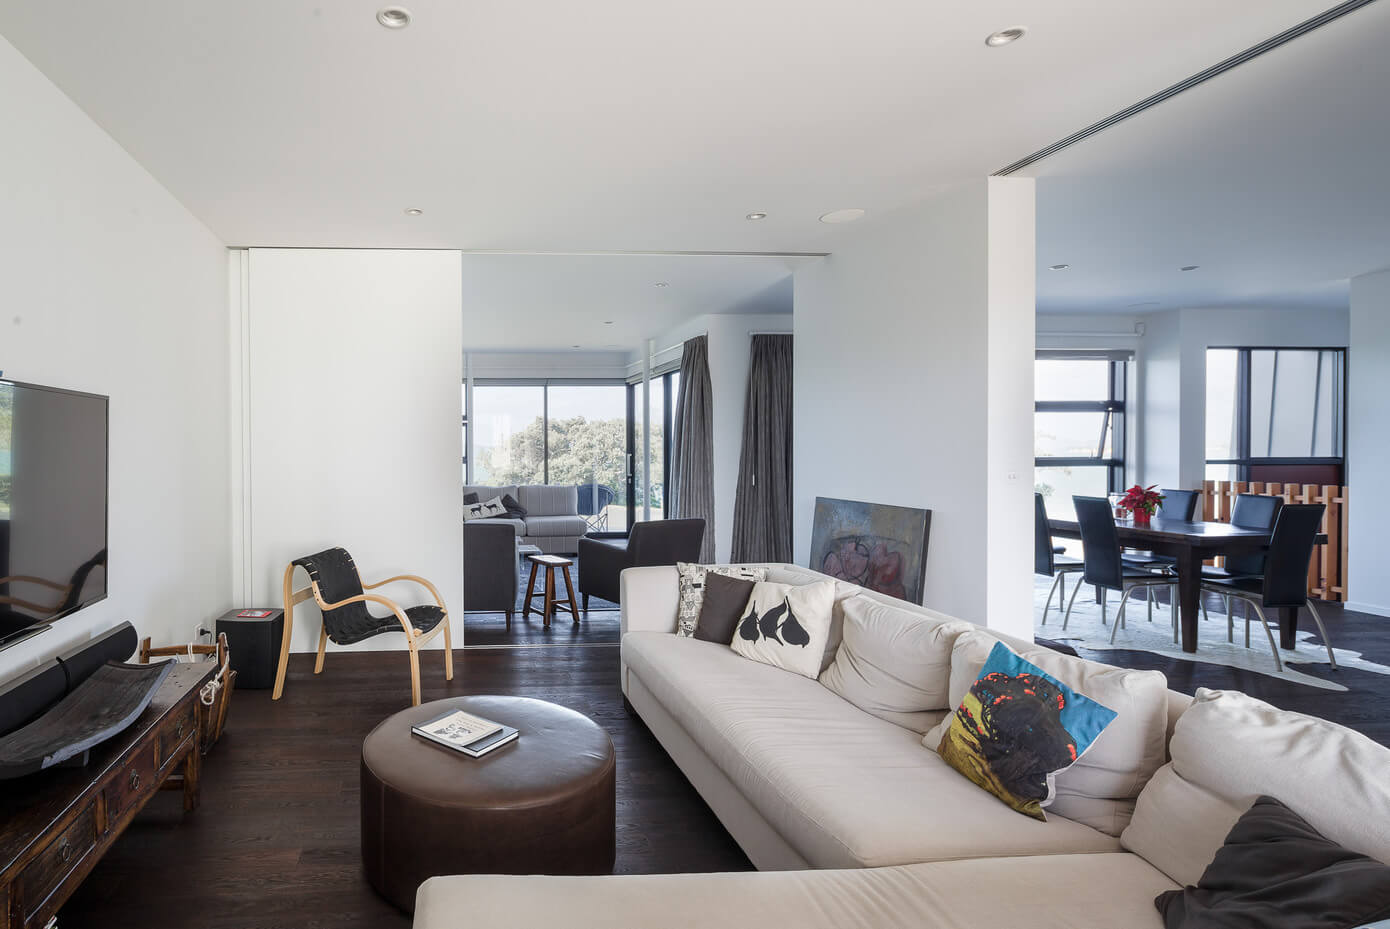 mclaren-house-archaus-architects-03